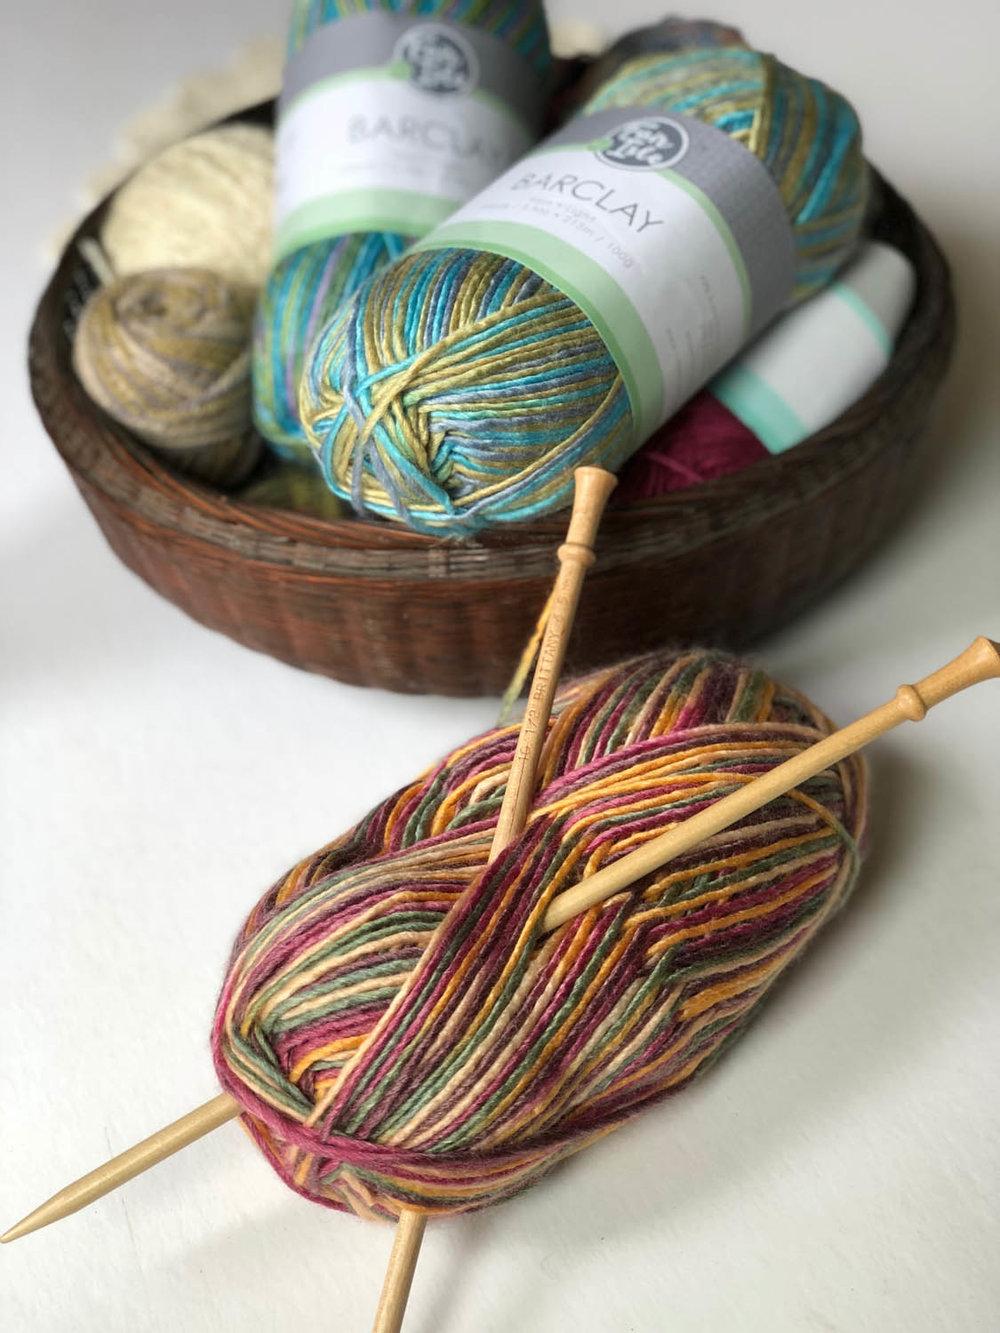 Barclay variegated superwash yarn by Fair Isle Yarns